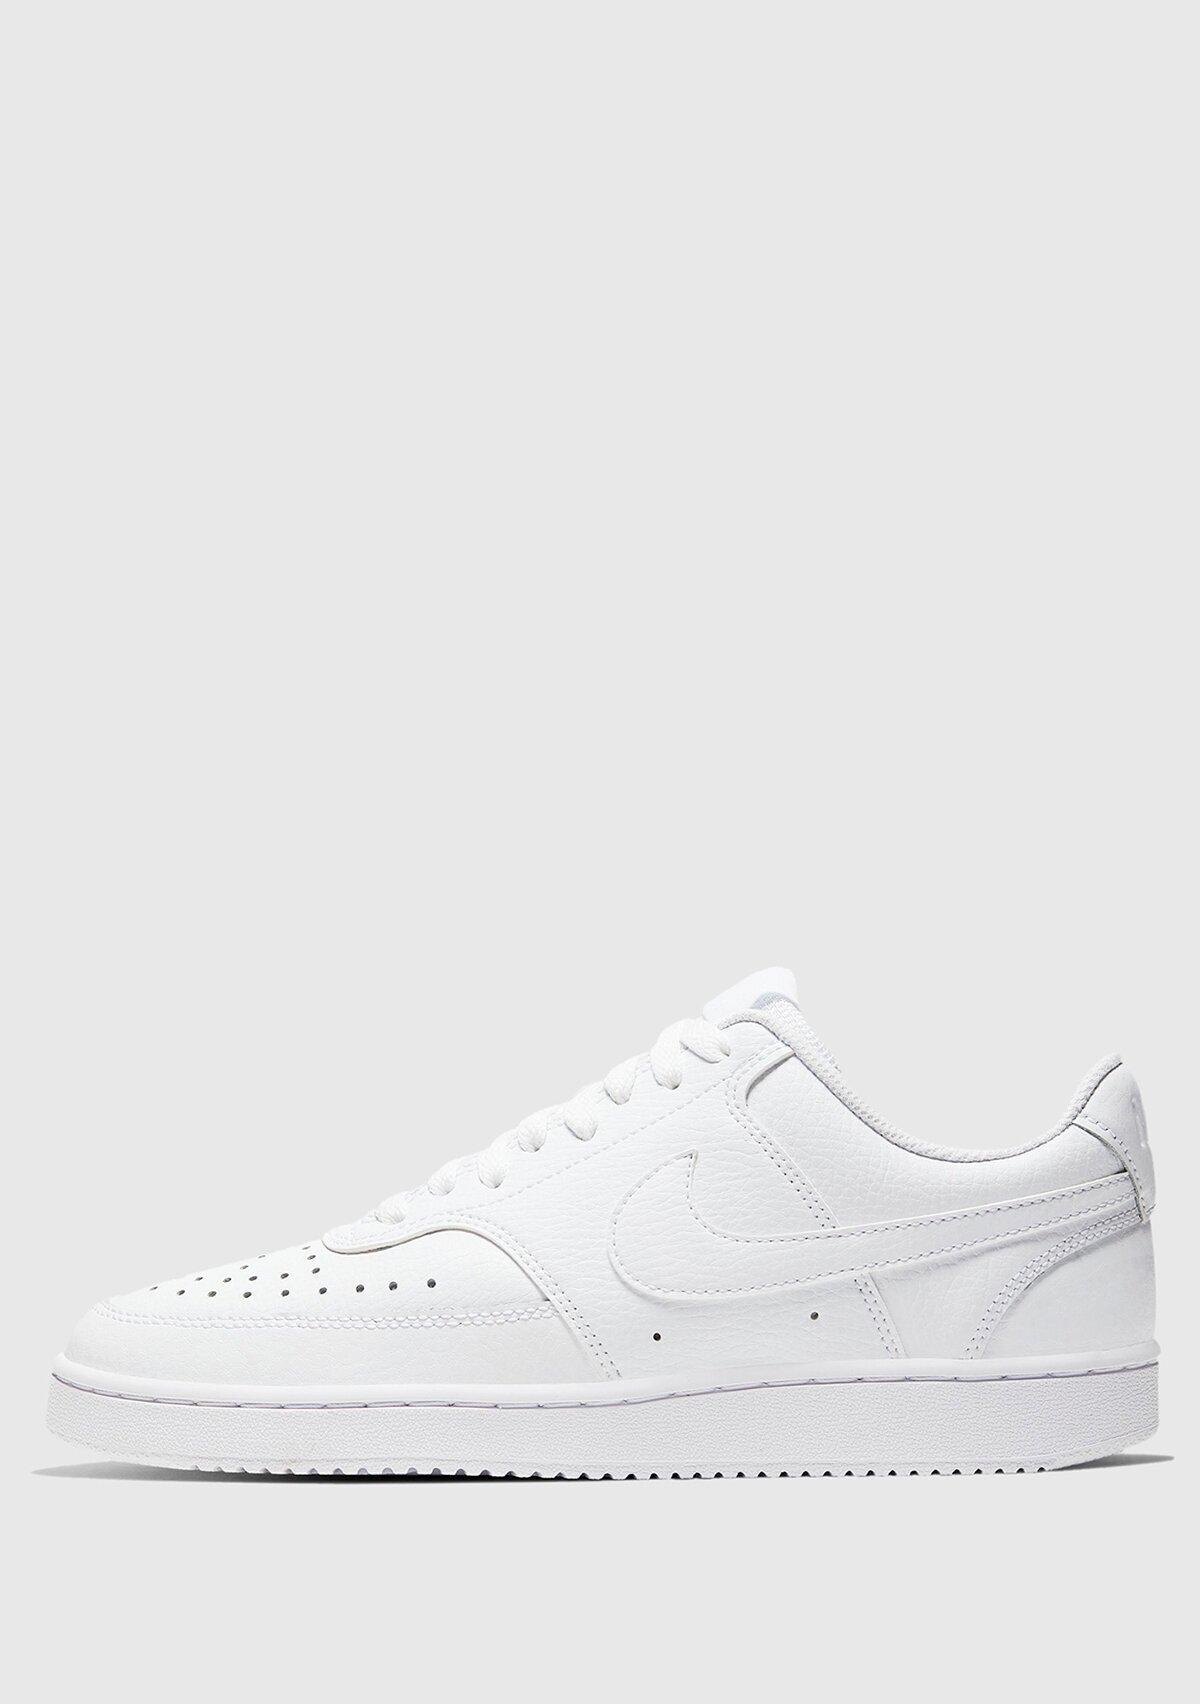 resm Wmns Court Vision Low Beyaz Kadın Sneaker Cd5434-100